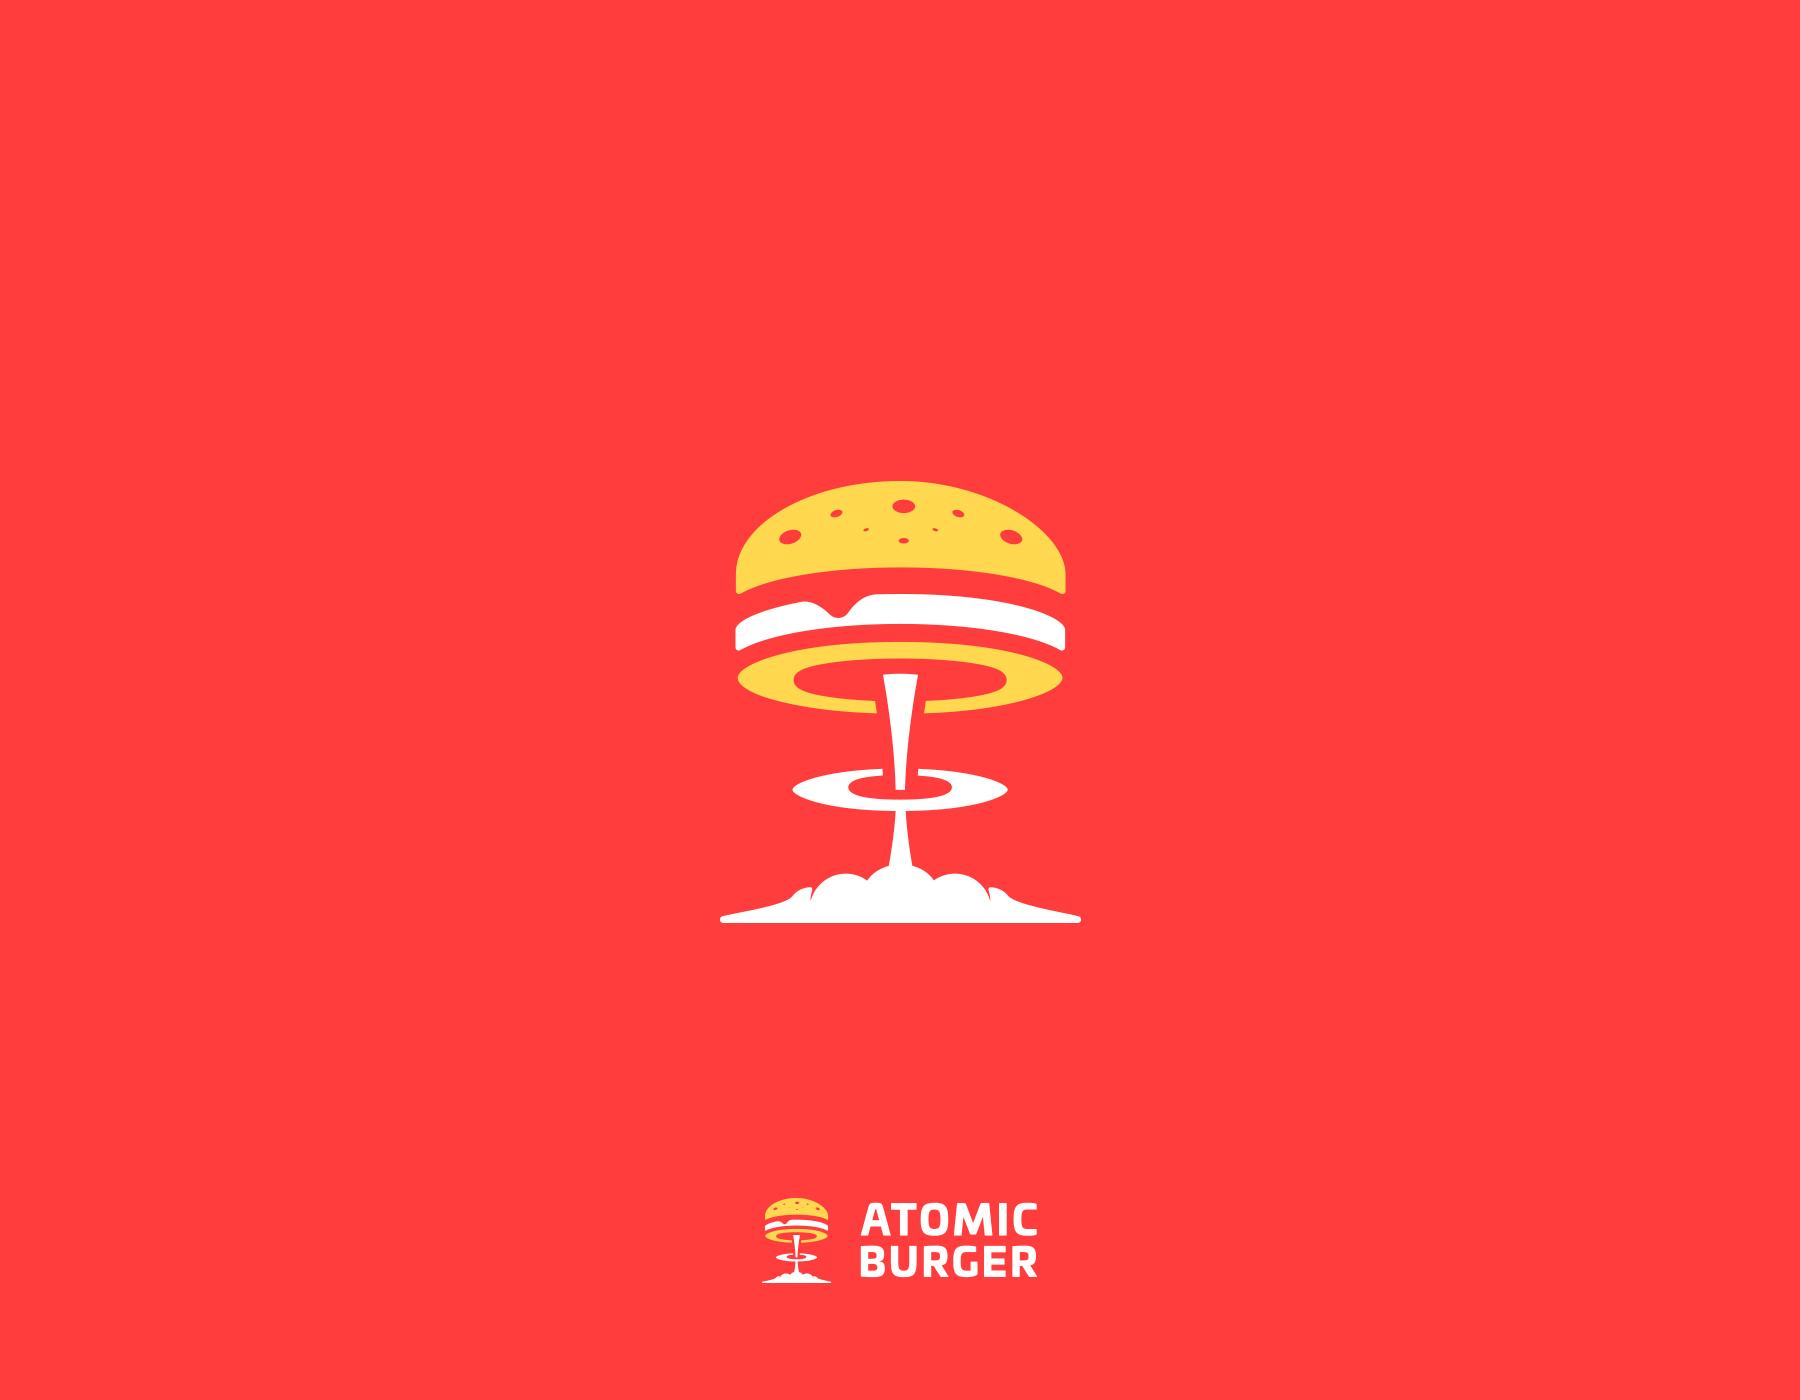 Creative logos with hidden symbolic meaning - Atomic Burger